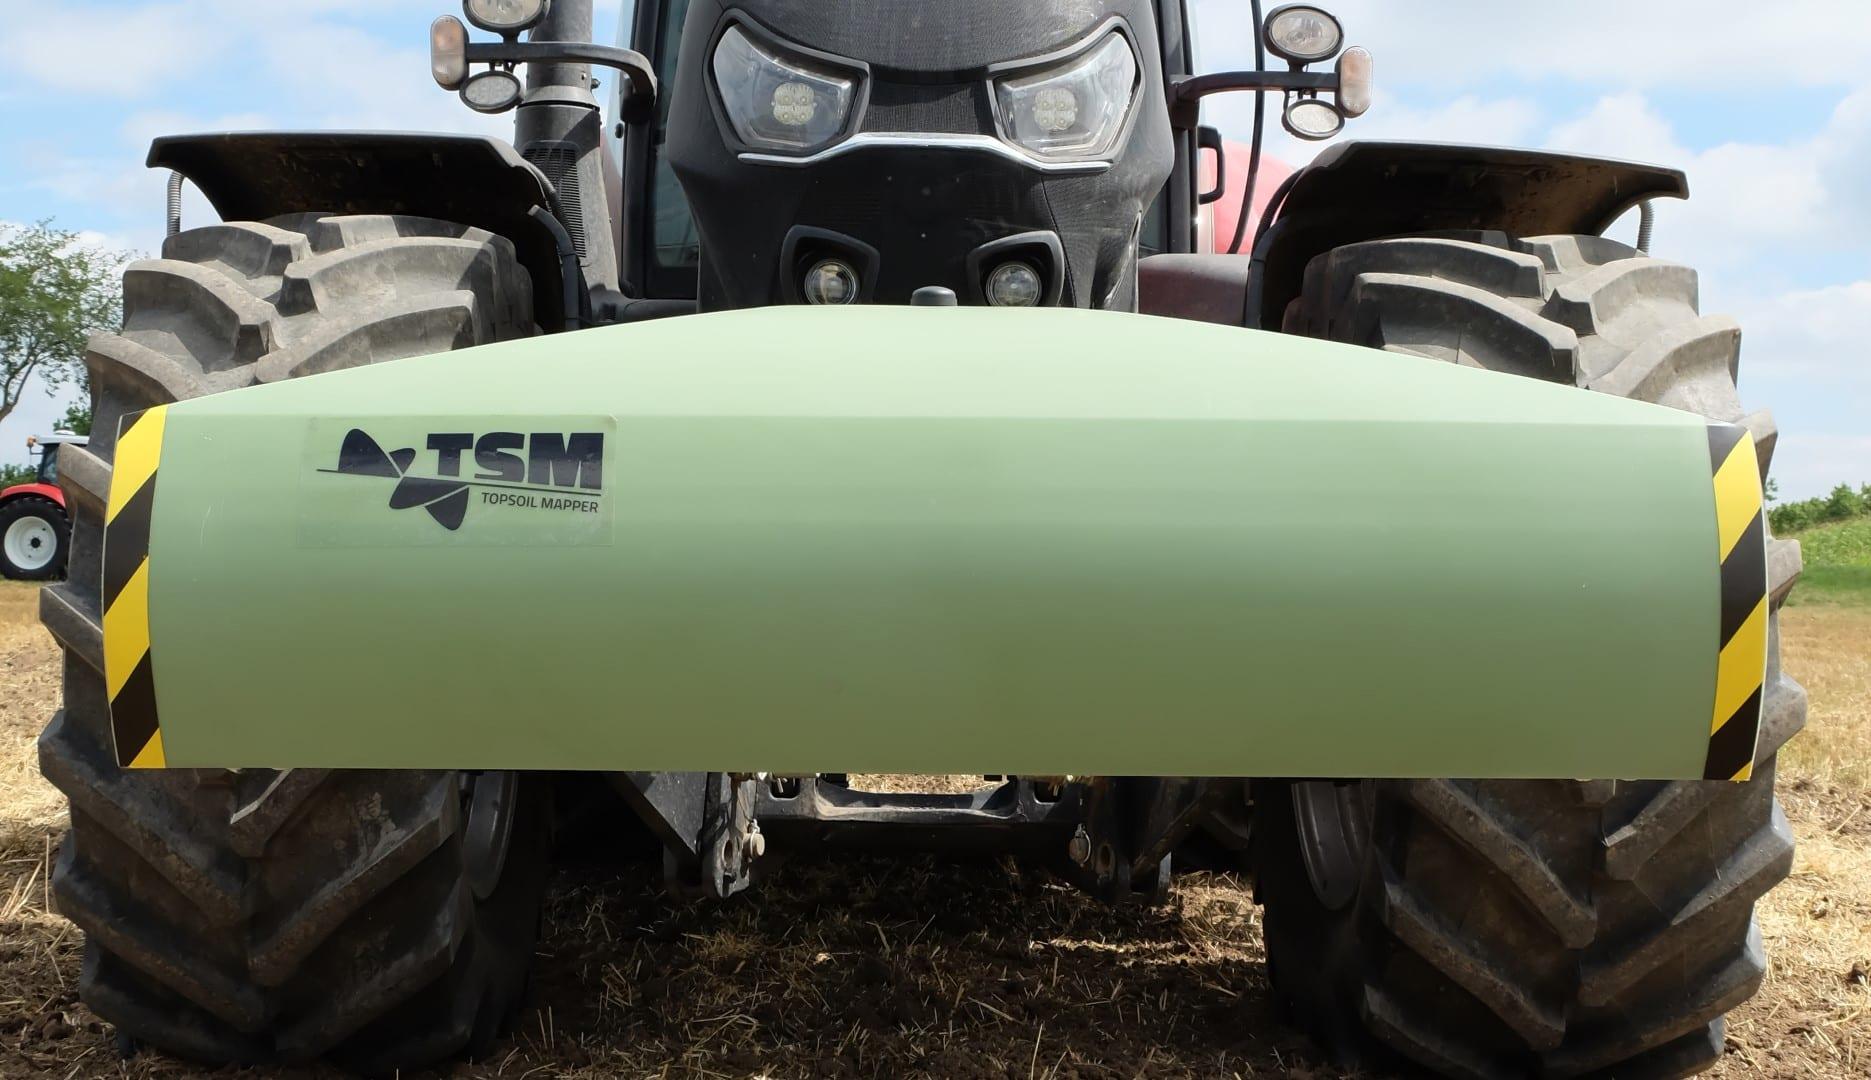 Topsoil Mapper Grün an der Front eines Traktors